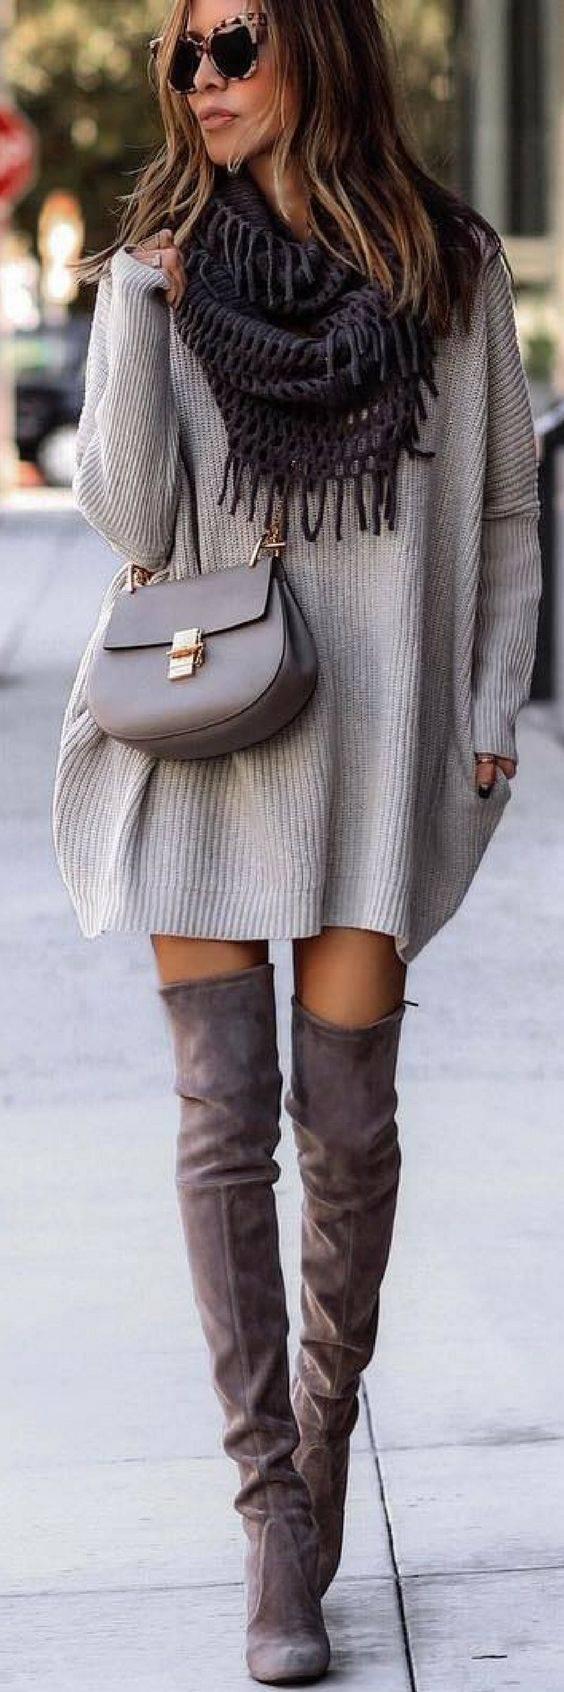 winter-wear-for-women-high-neck-sweater-dress_image